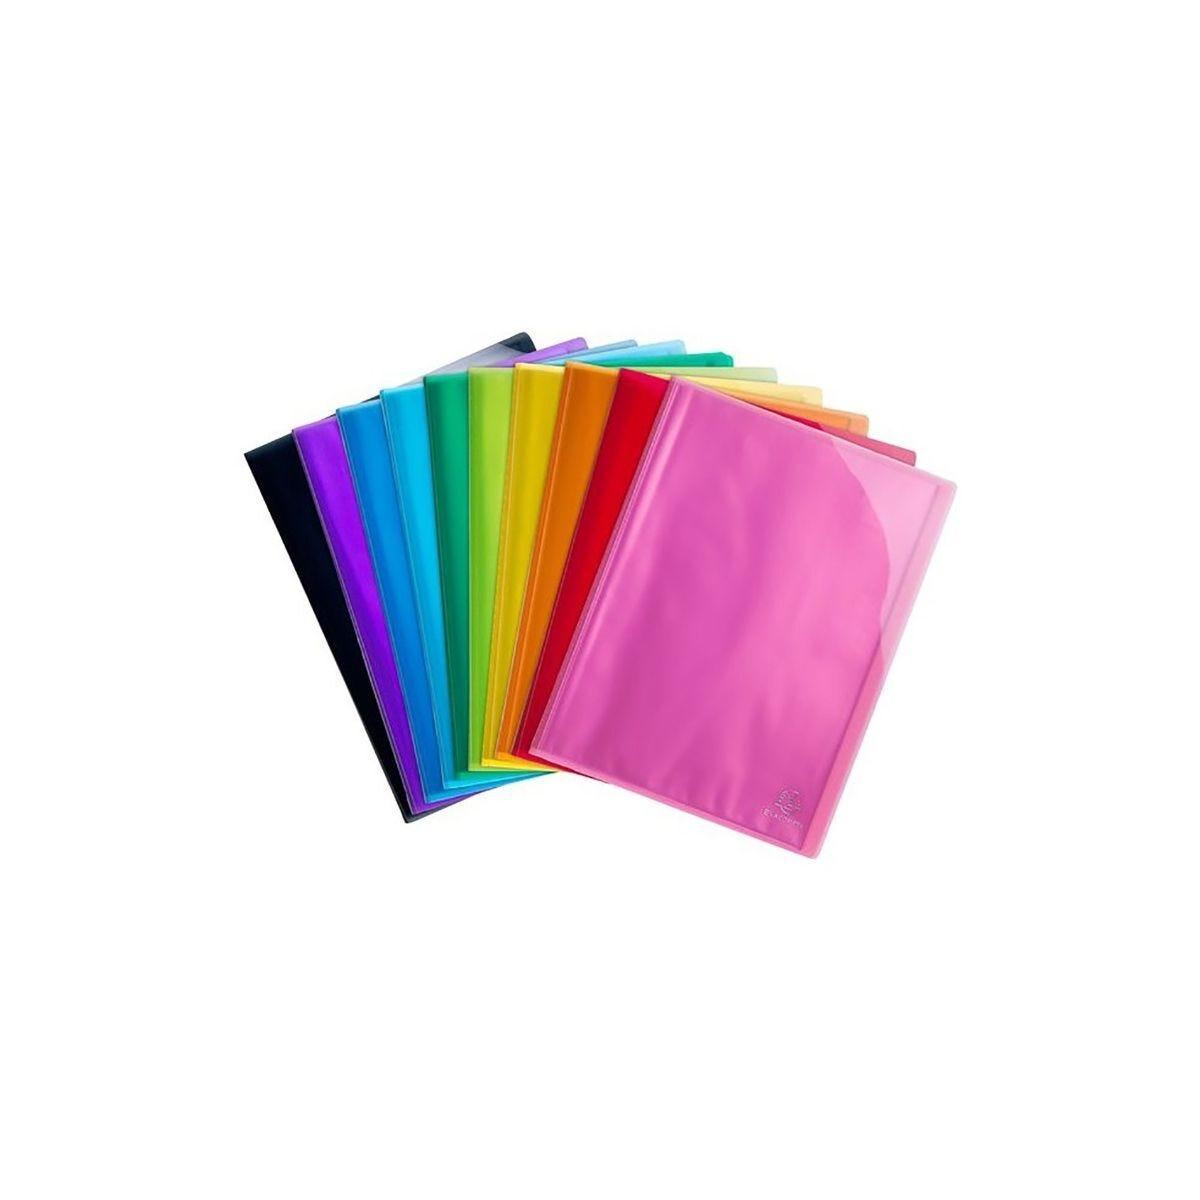 Iderama Polypropylene Display Book A4 20 Pocket Pack of 20 Assorted